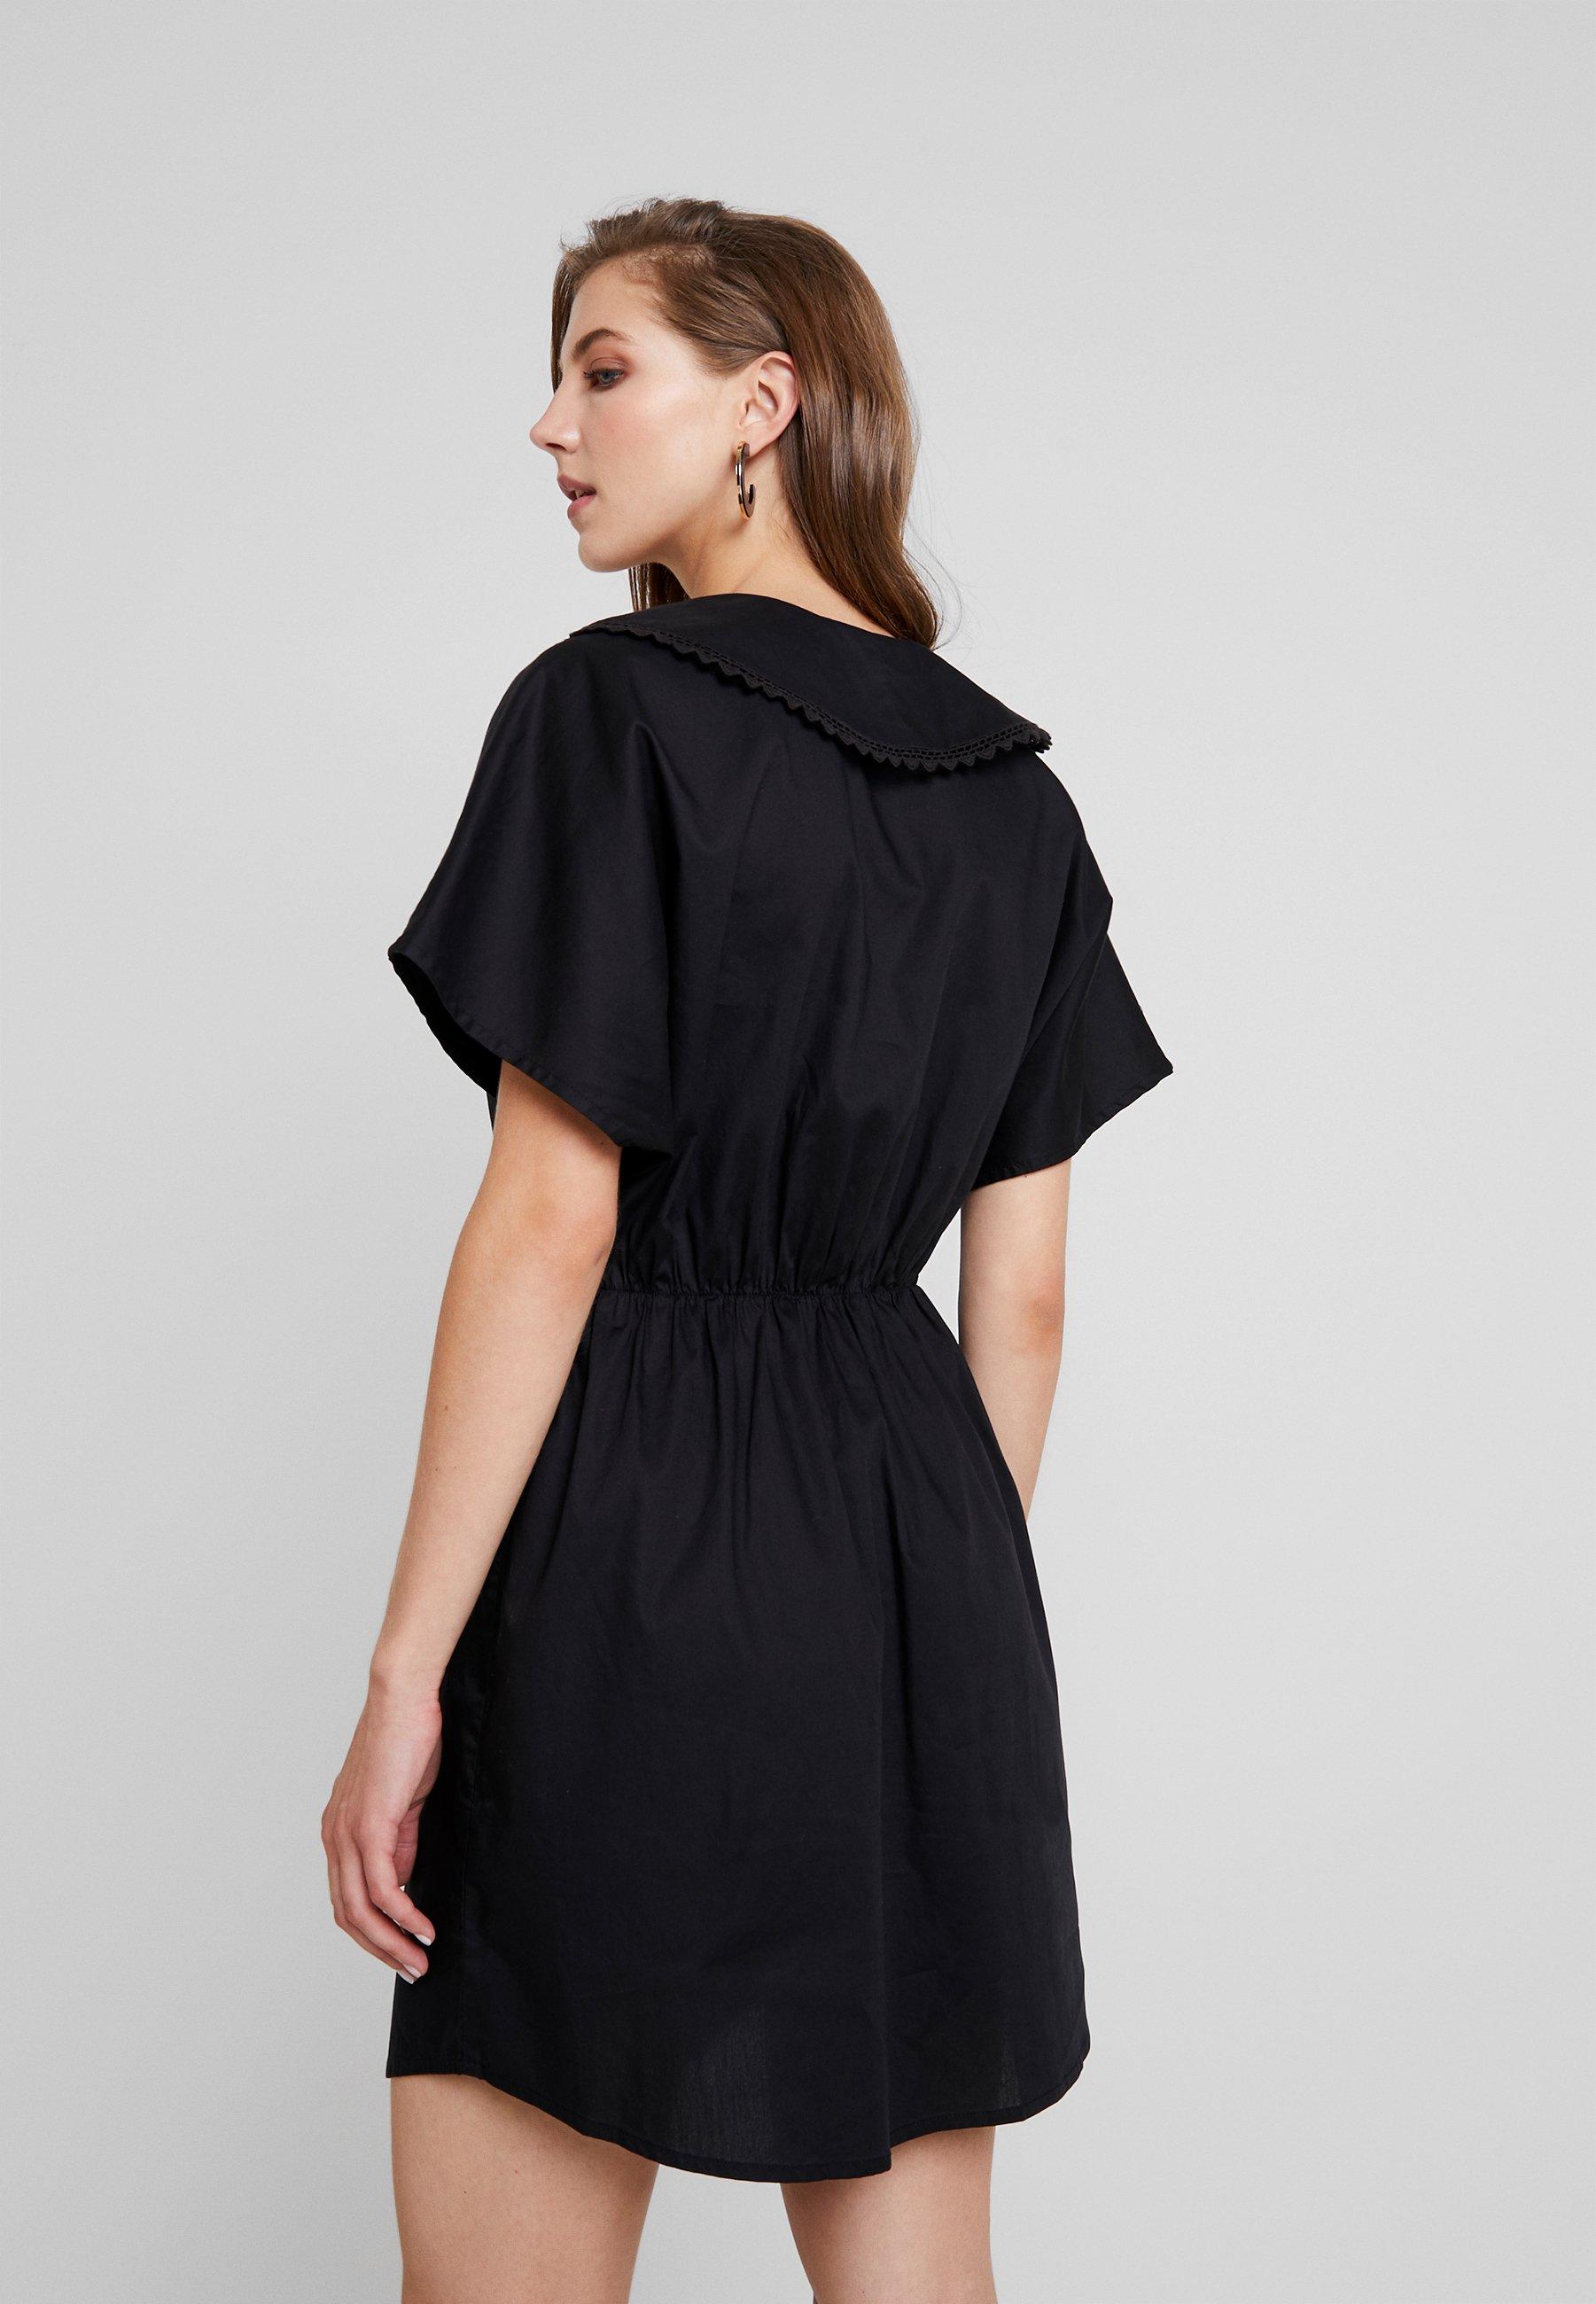 Monki Signe DressRobe Chemise Monki Signe DressRobe Black Nv8wmn0